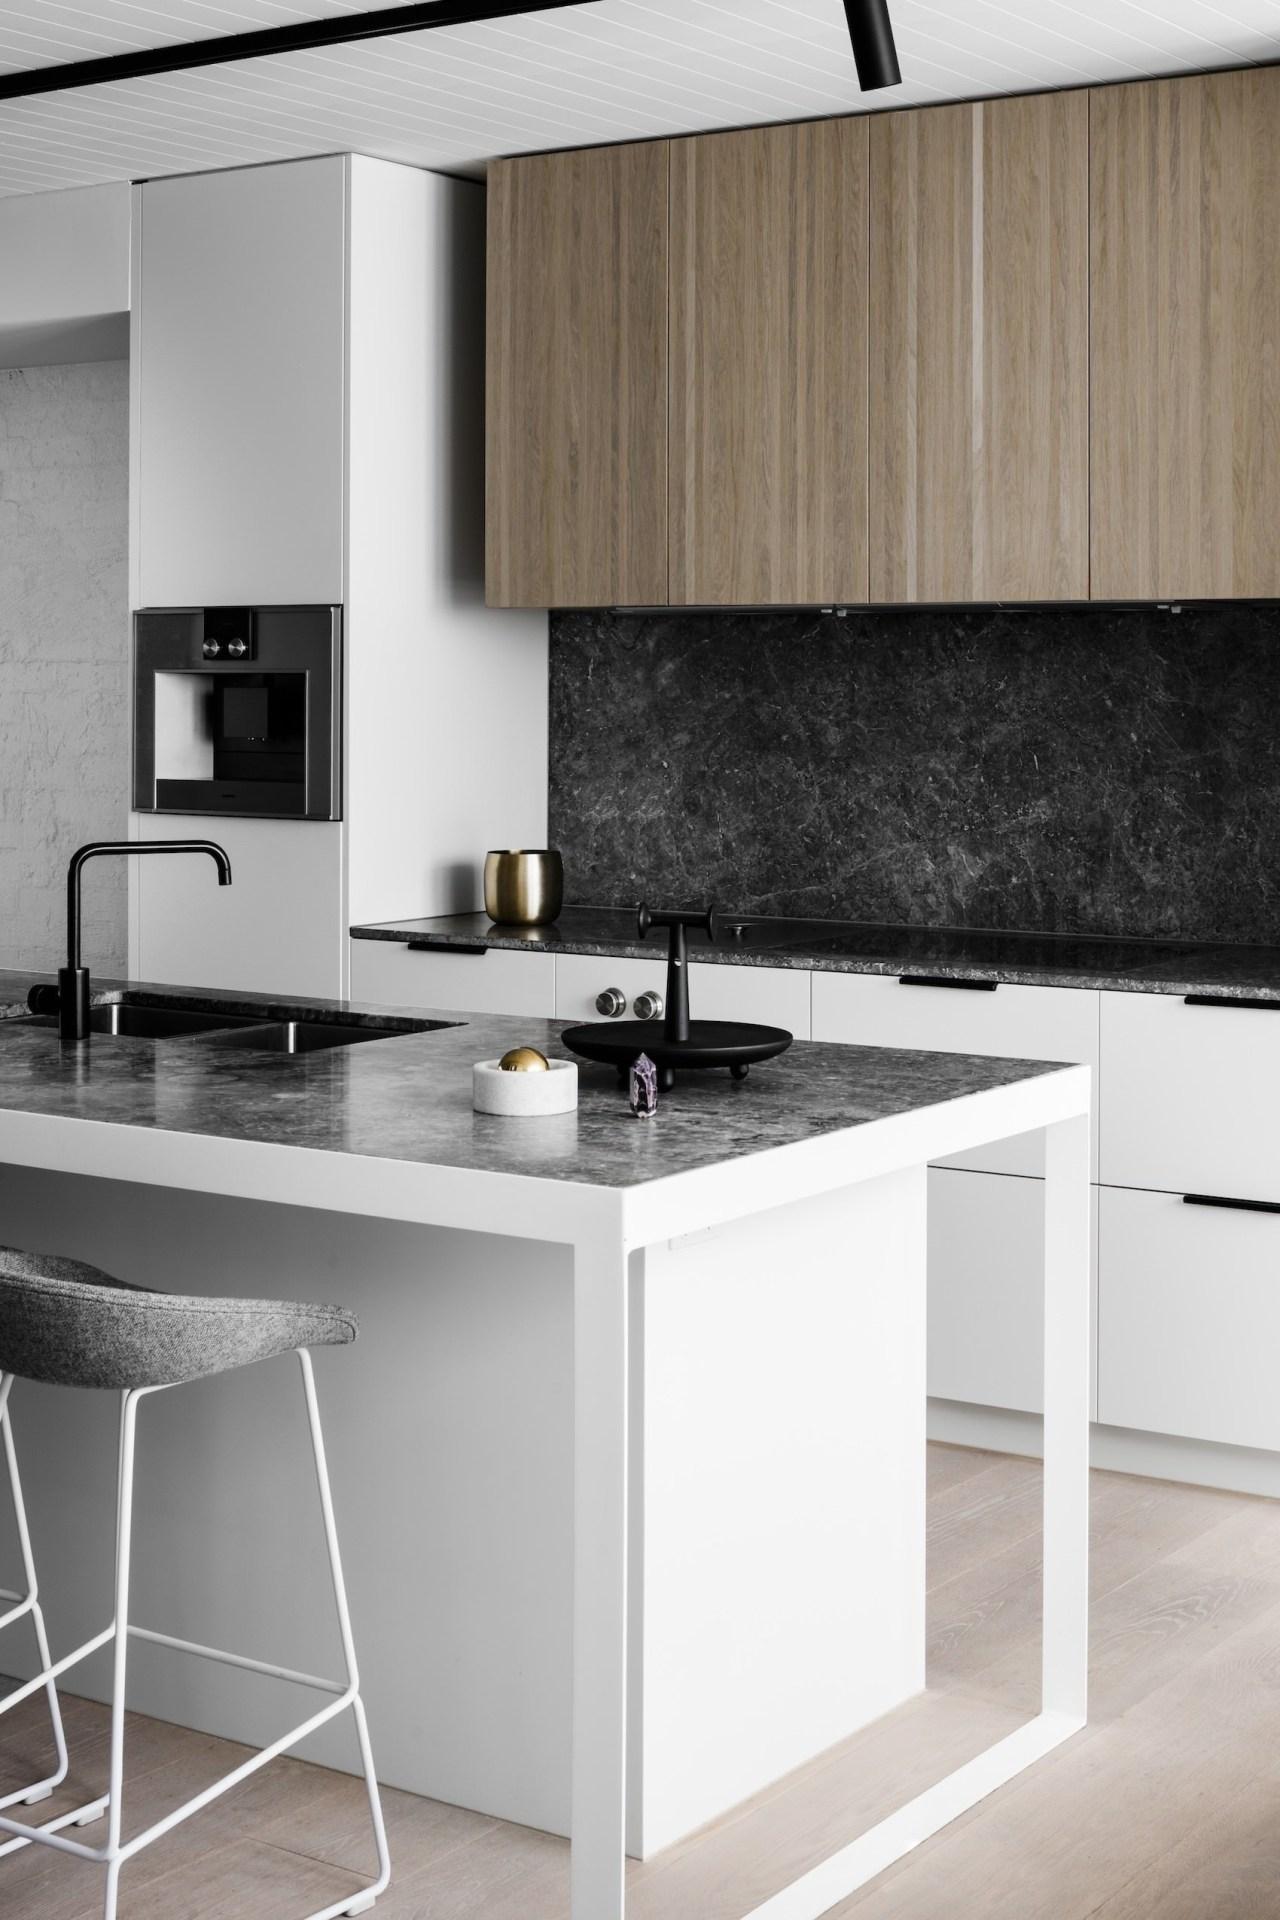 Architect: Technē Architecture + Interior DesignPhotography by Tom cabinetry, countertop, cuisine classique, floor, interior design, kitchen, kitchen stove, product design, tap, white, gray